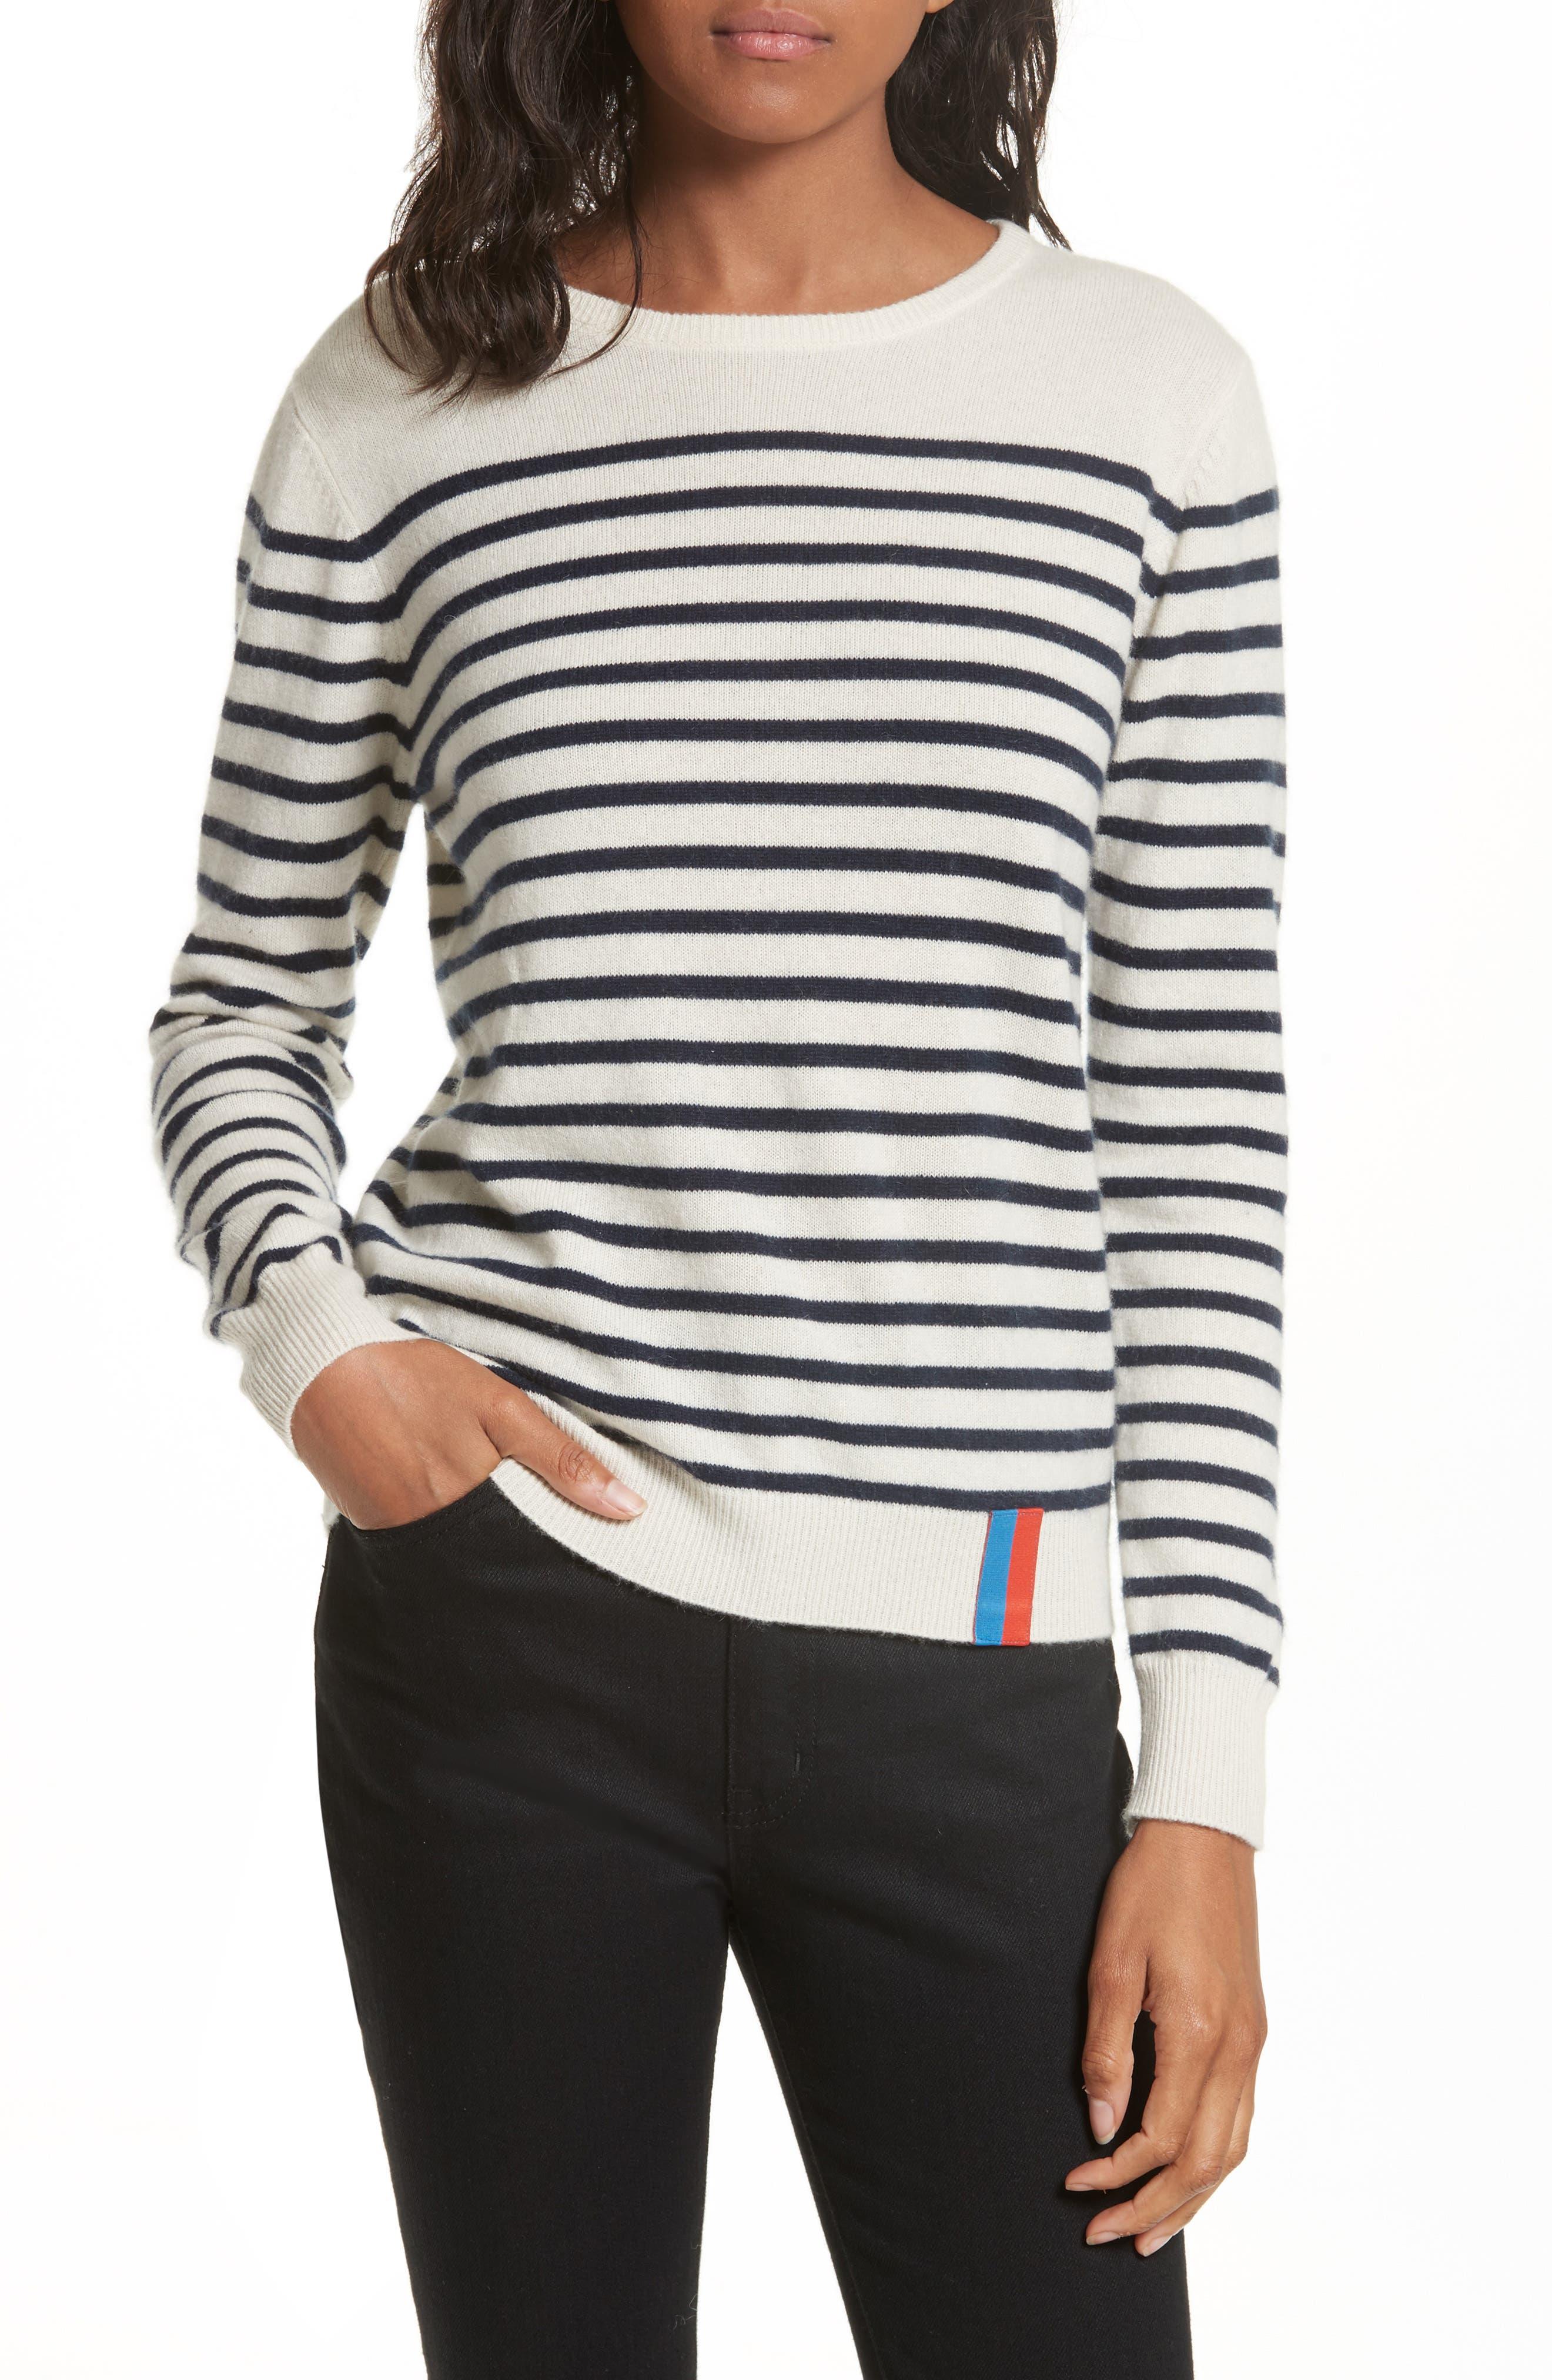 KULE Stripe Cashmere Sweater in Cream/ Navy